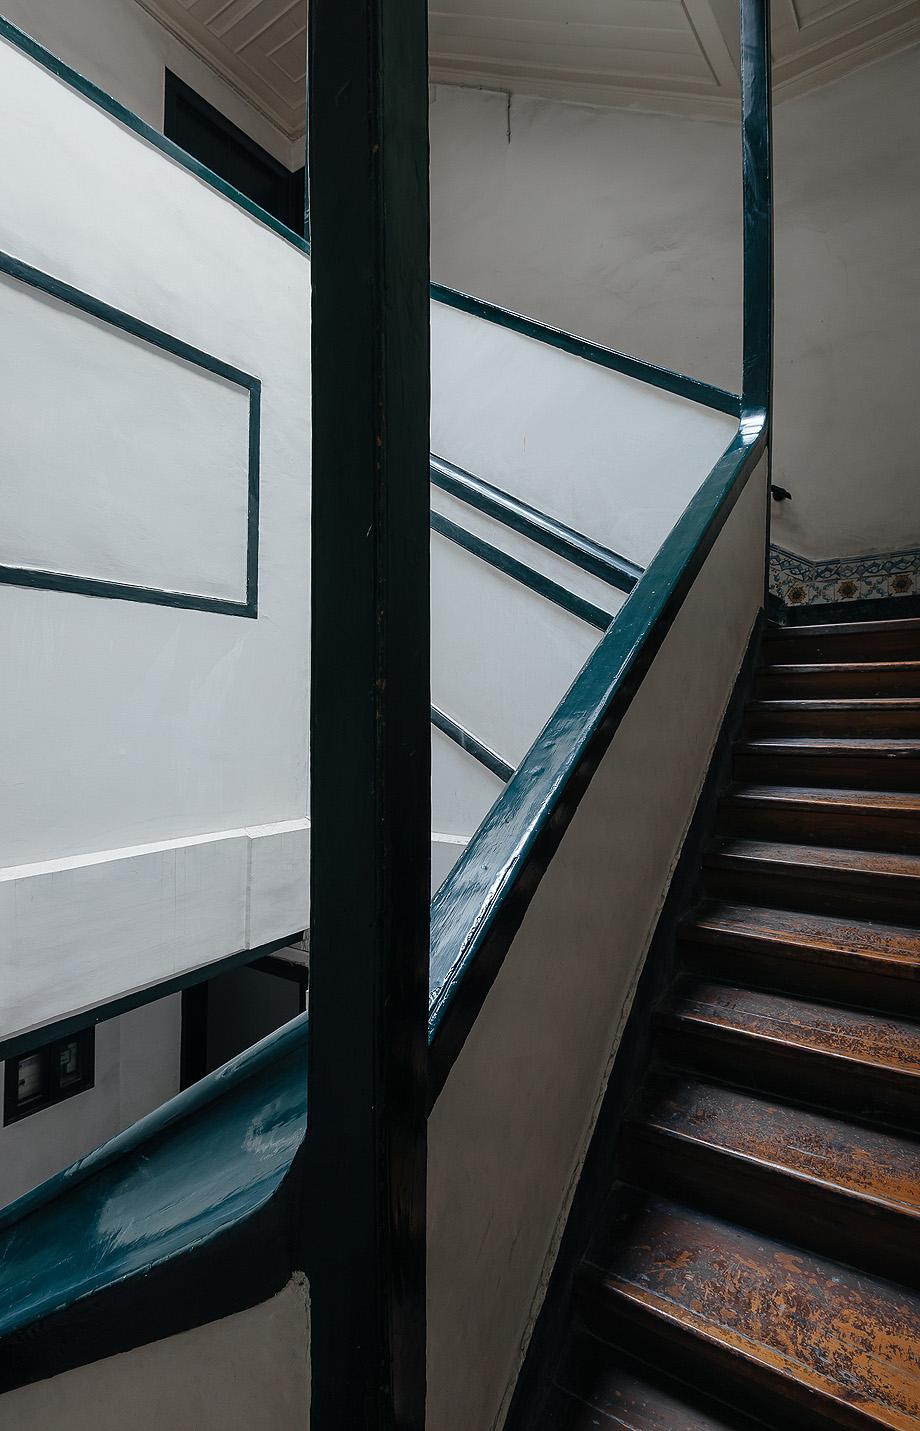 apartamentos pombalinos de aurora arquitectos - foto do mal o menos (40)